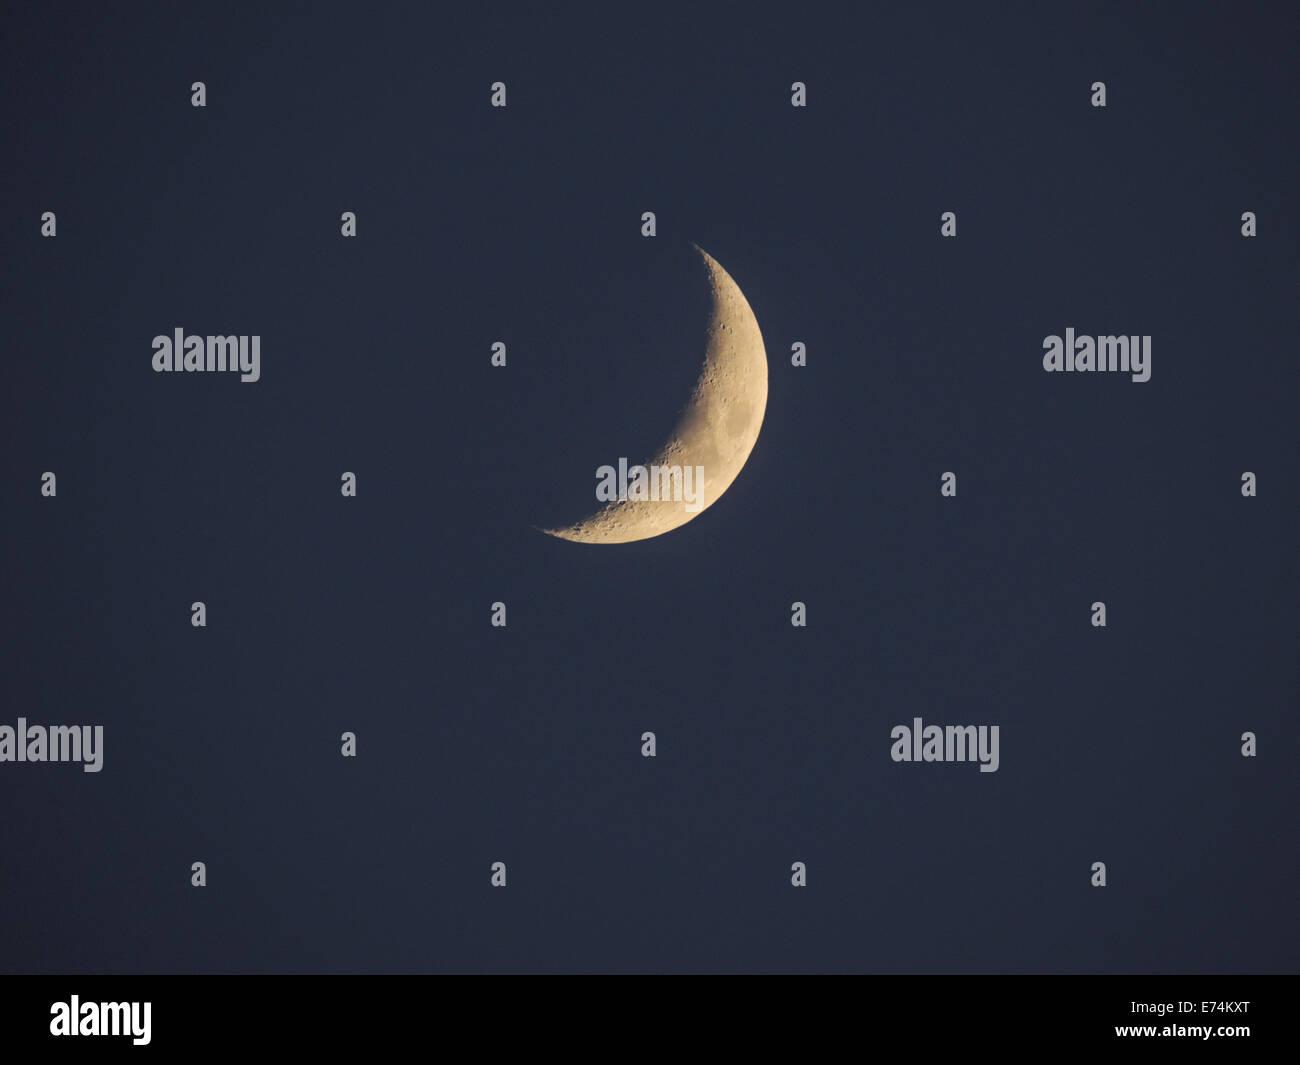 Crescent Moons Stockfotos & Crescent Moons Bilder - Alamy